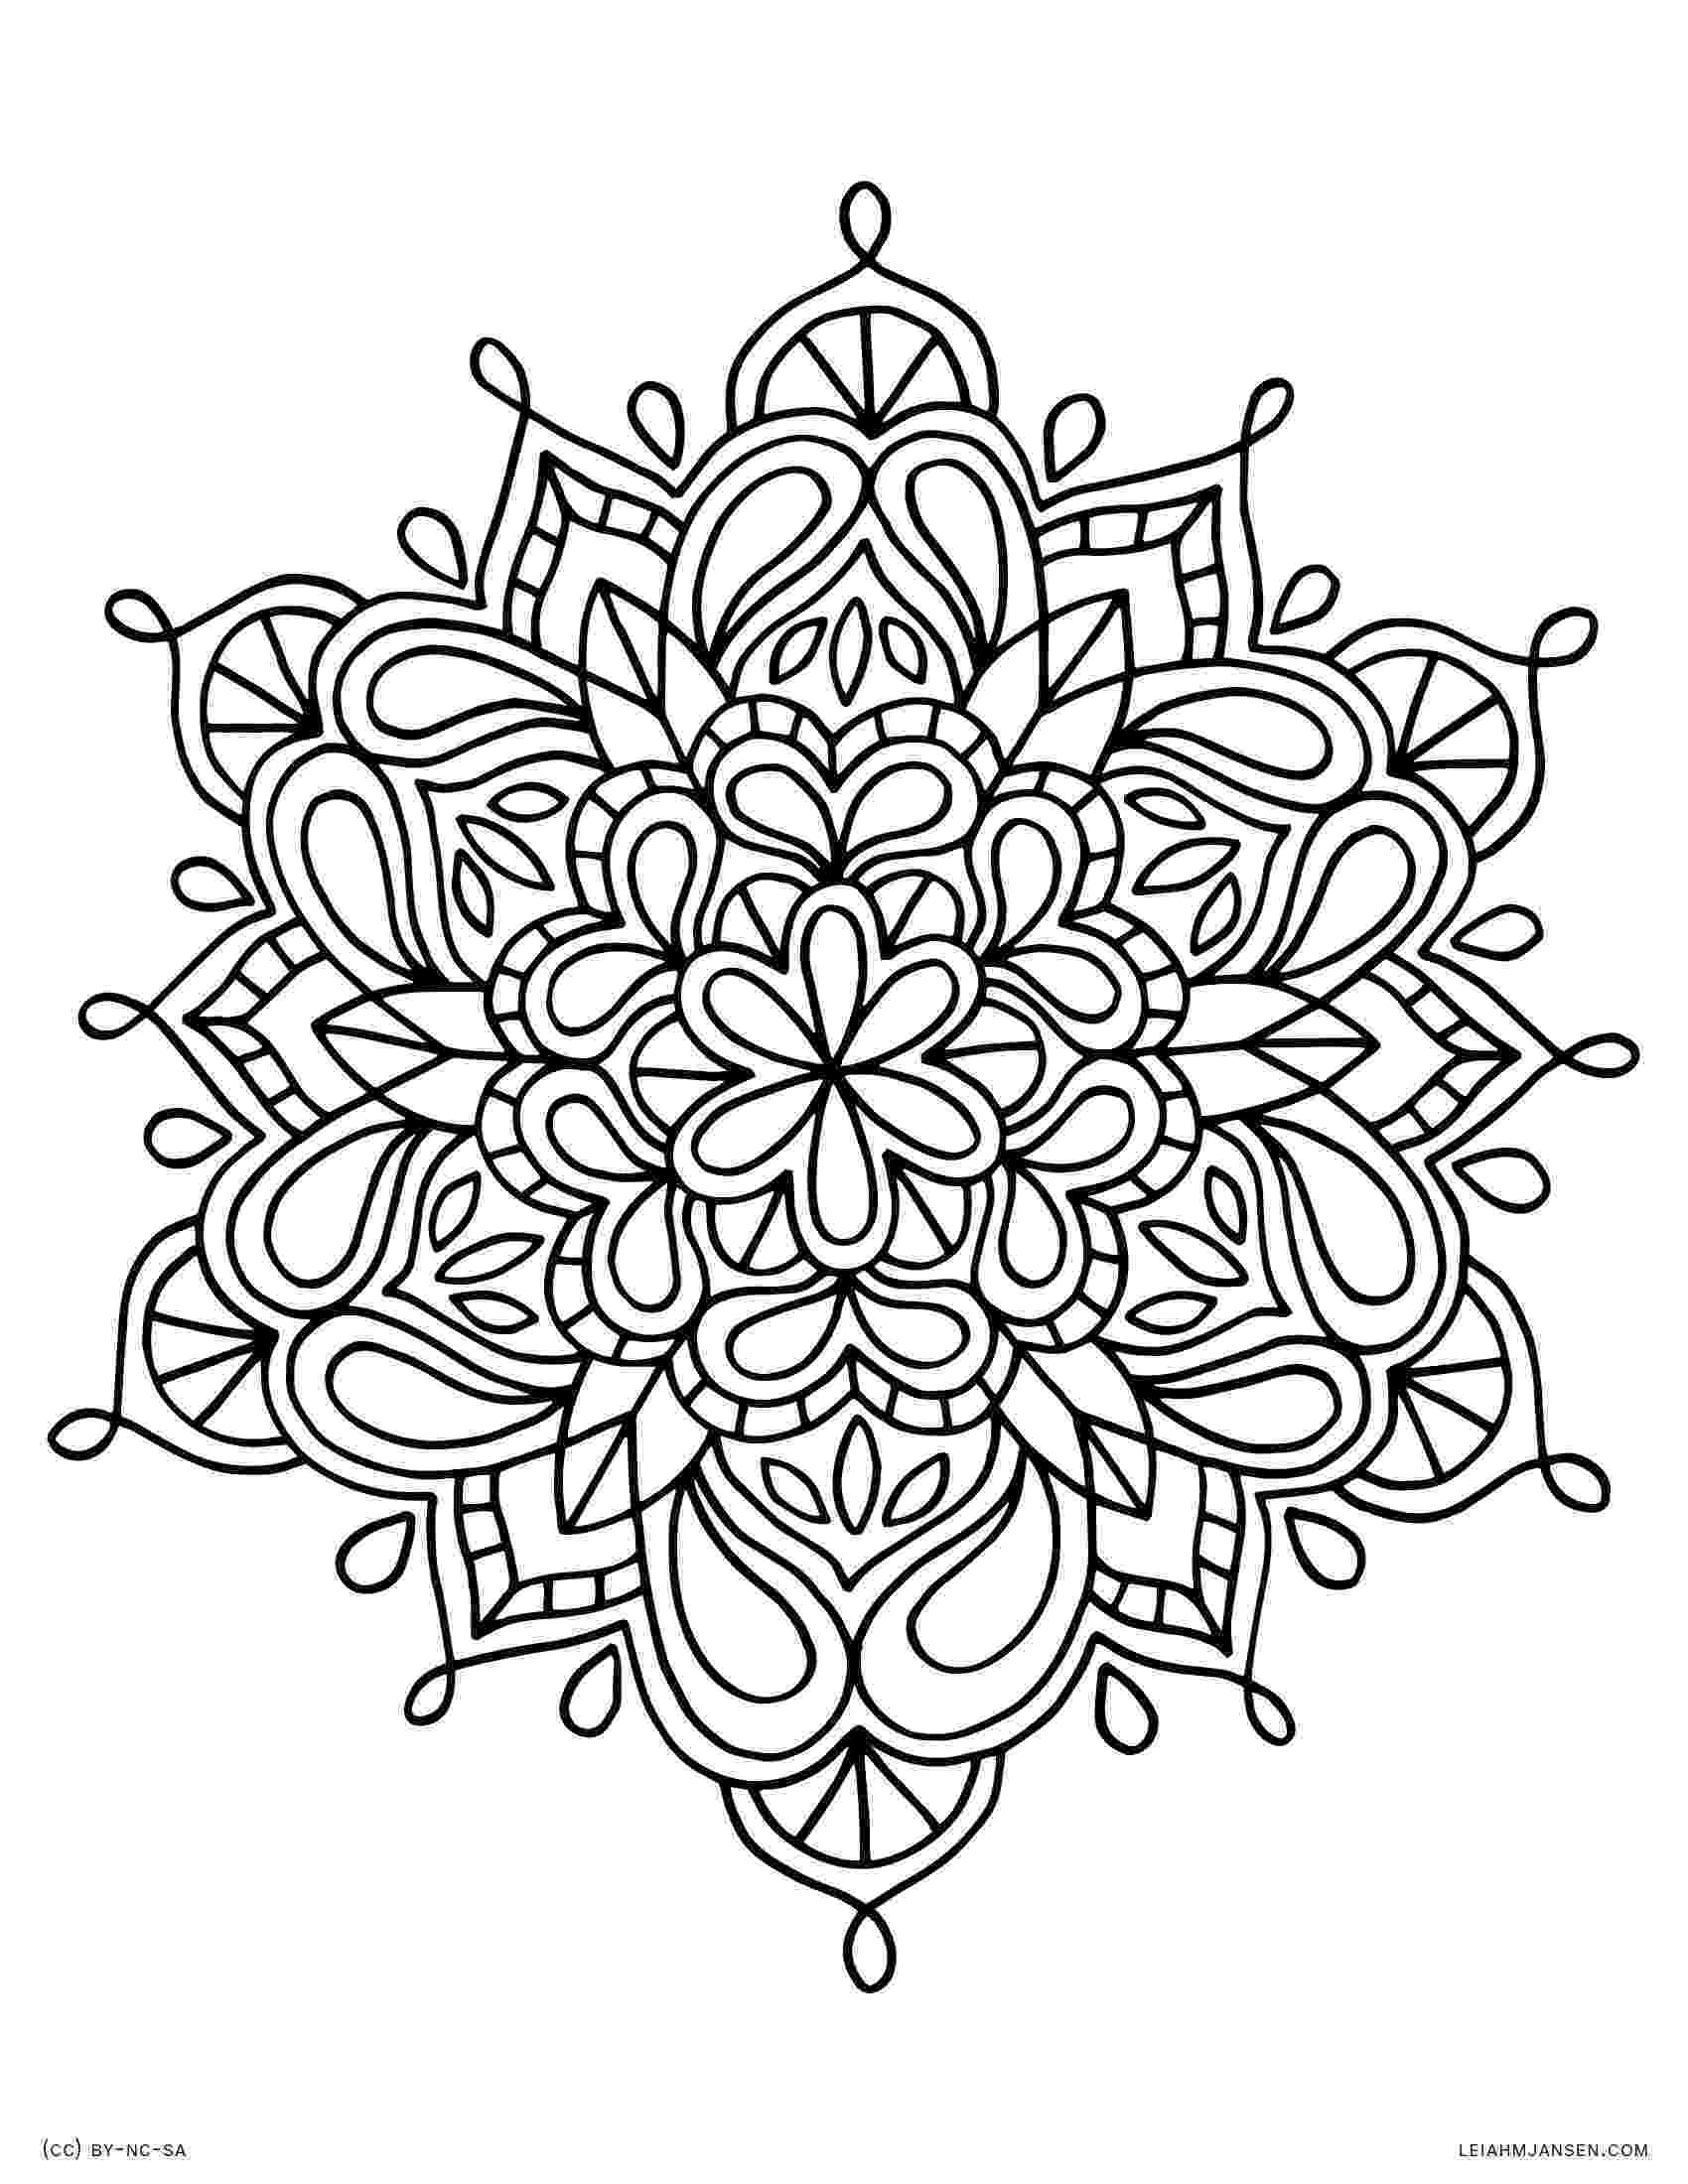 free mandalas to print coloring pages mandalas free to print